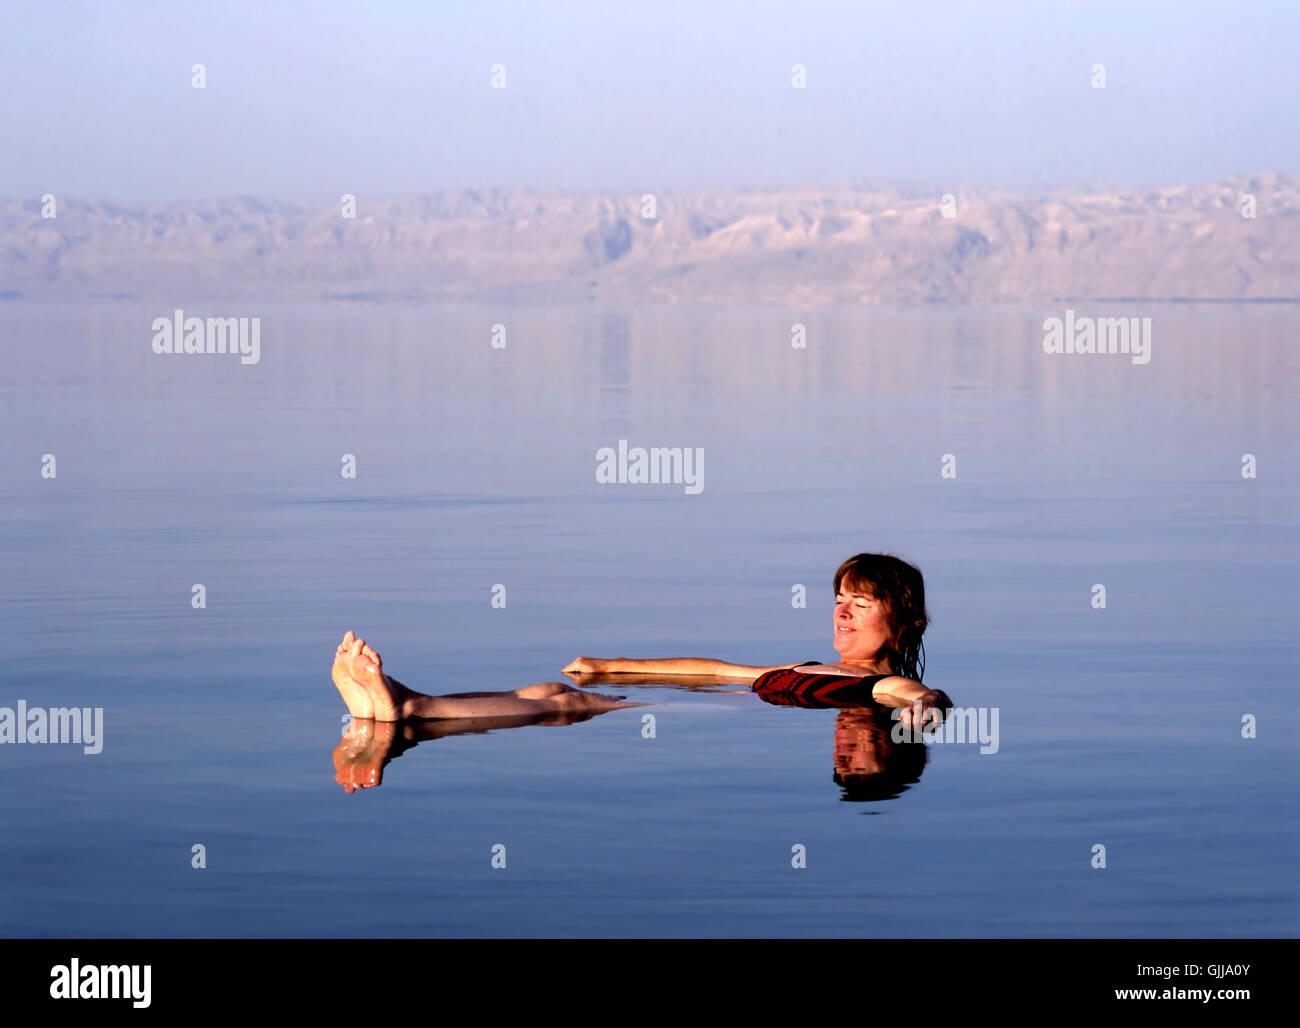 Girl flottant à la mer Morte, Jordanie Photo Stock